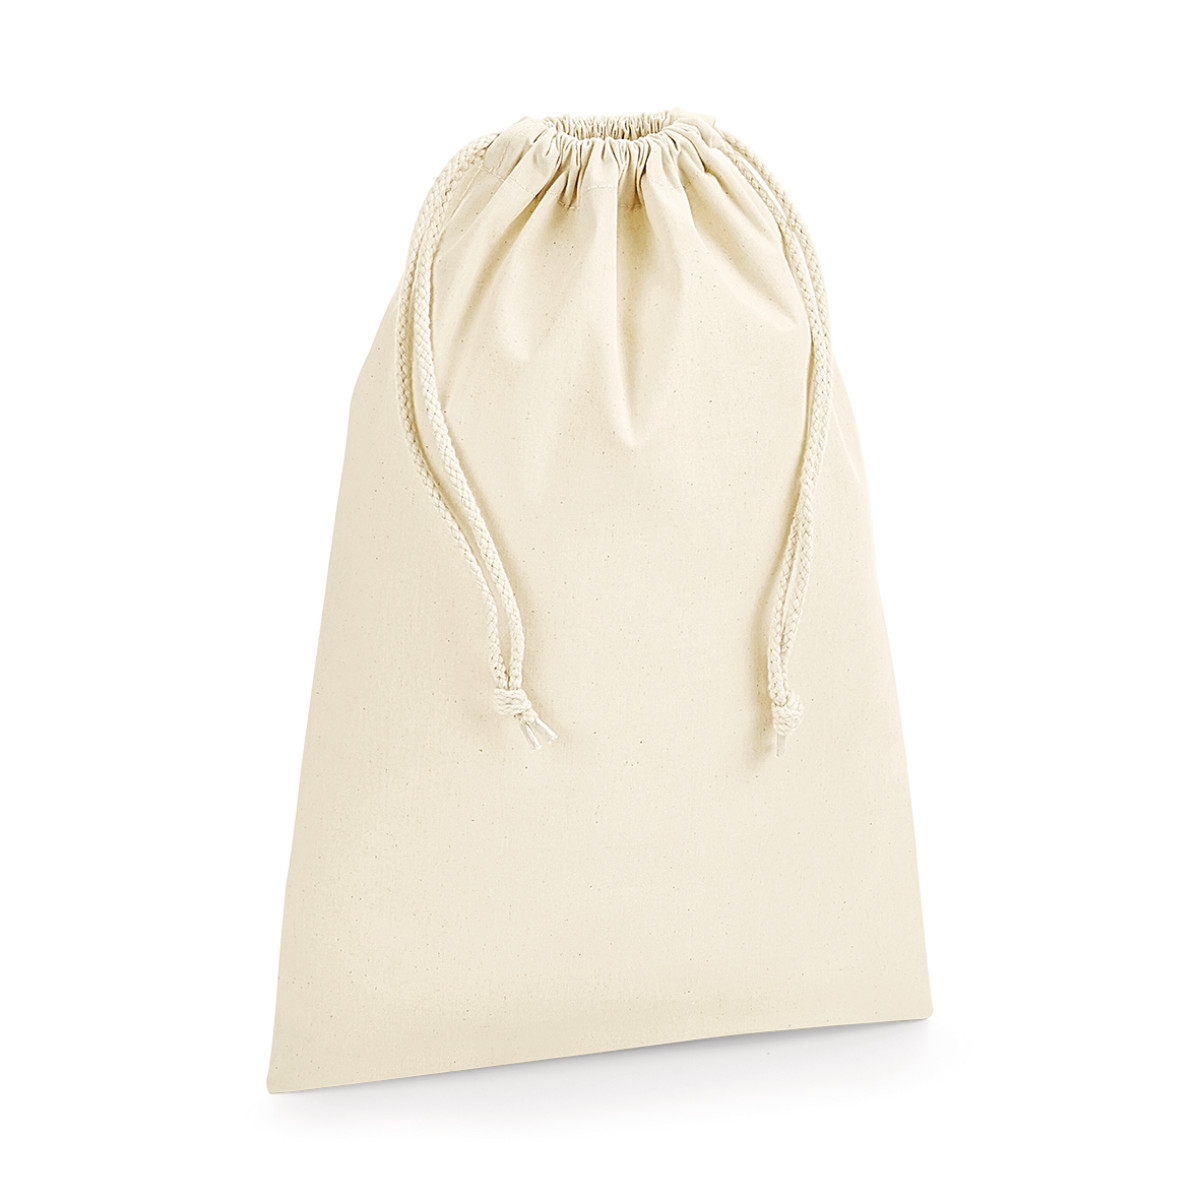 WFord Mill Org Premium Cotton Stuff Bag